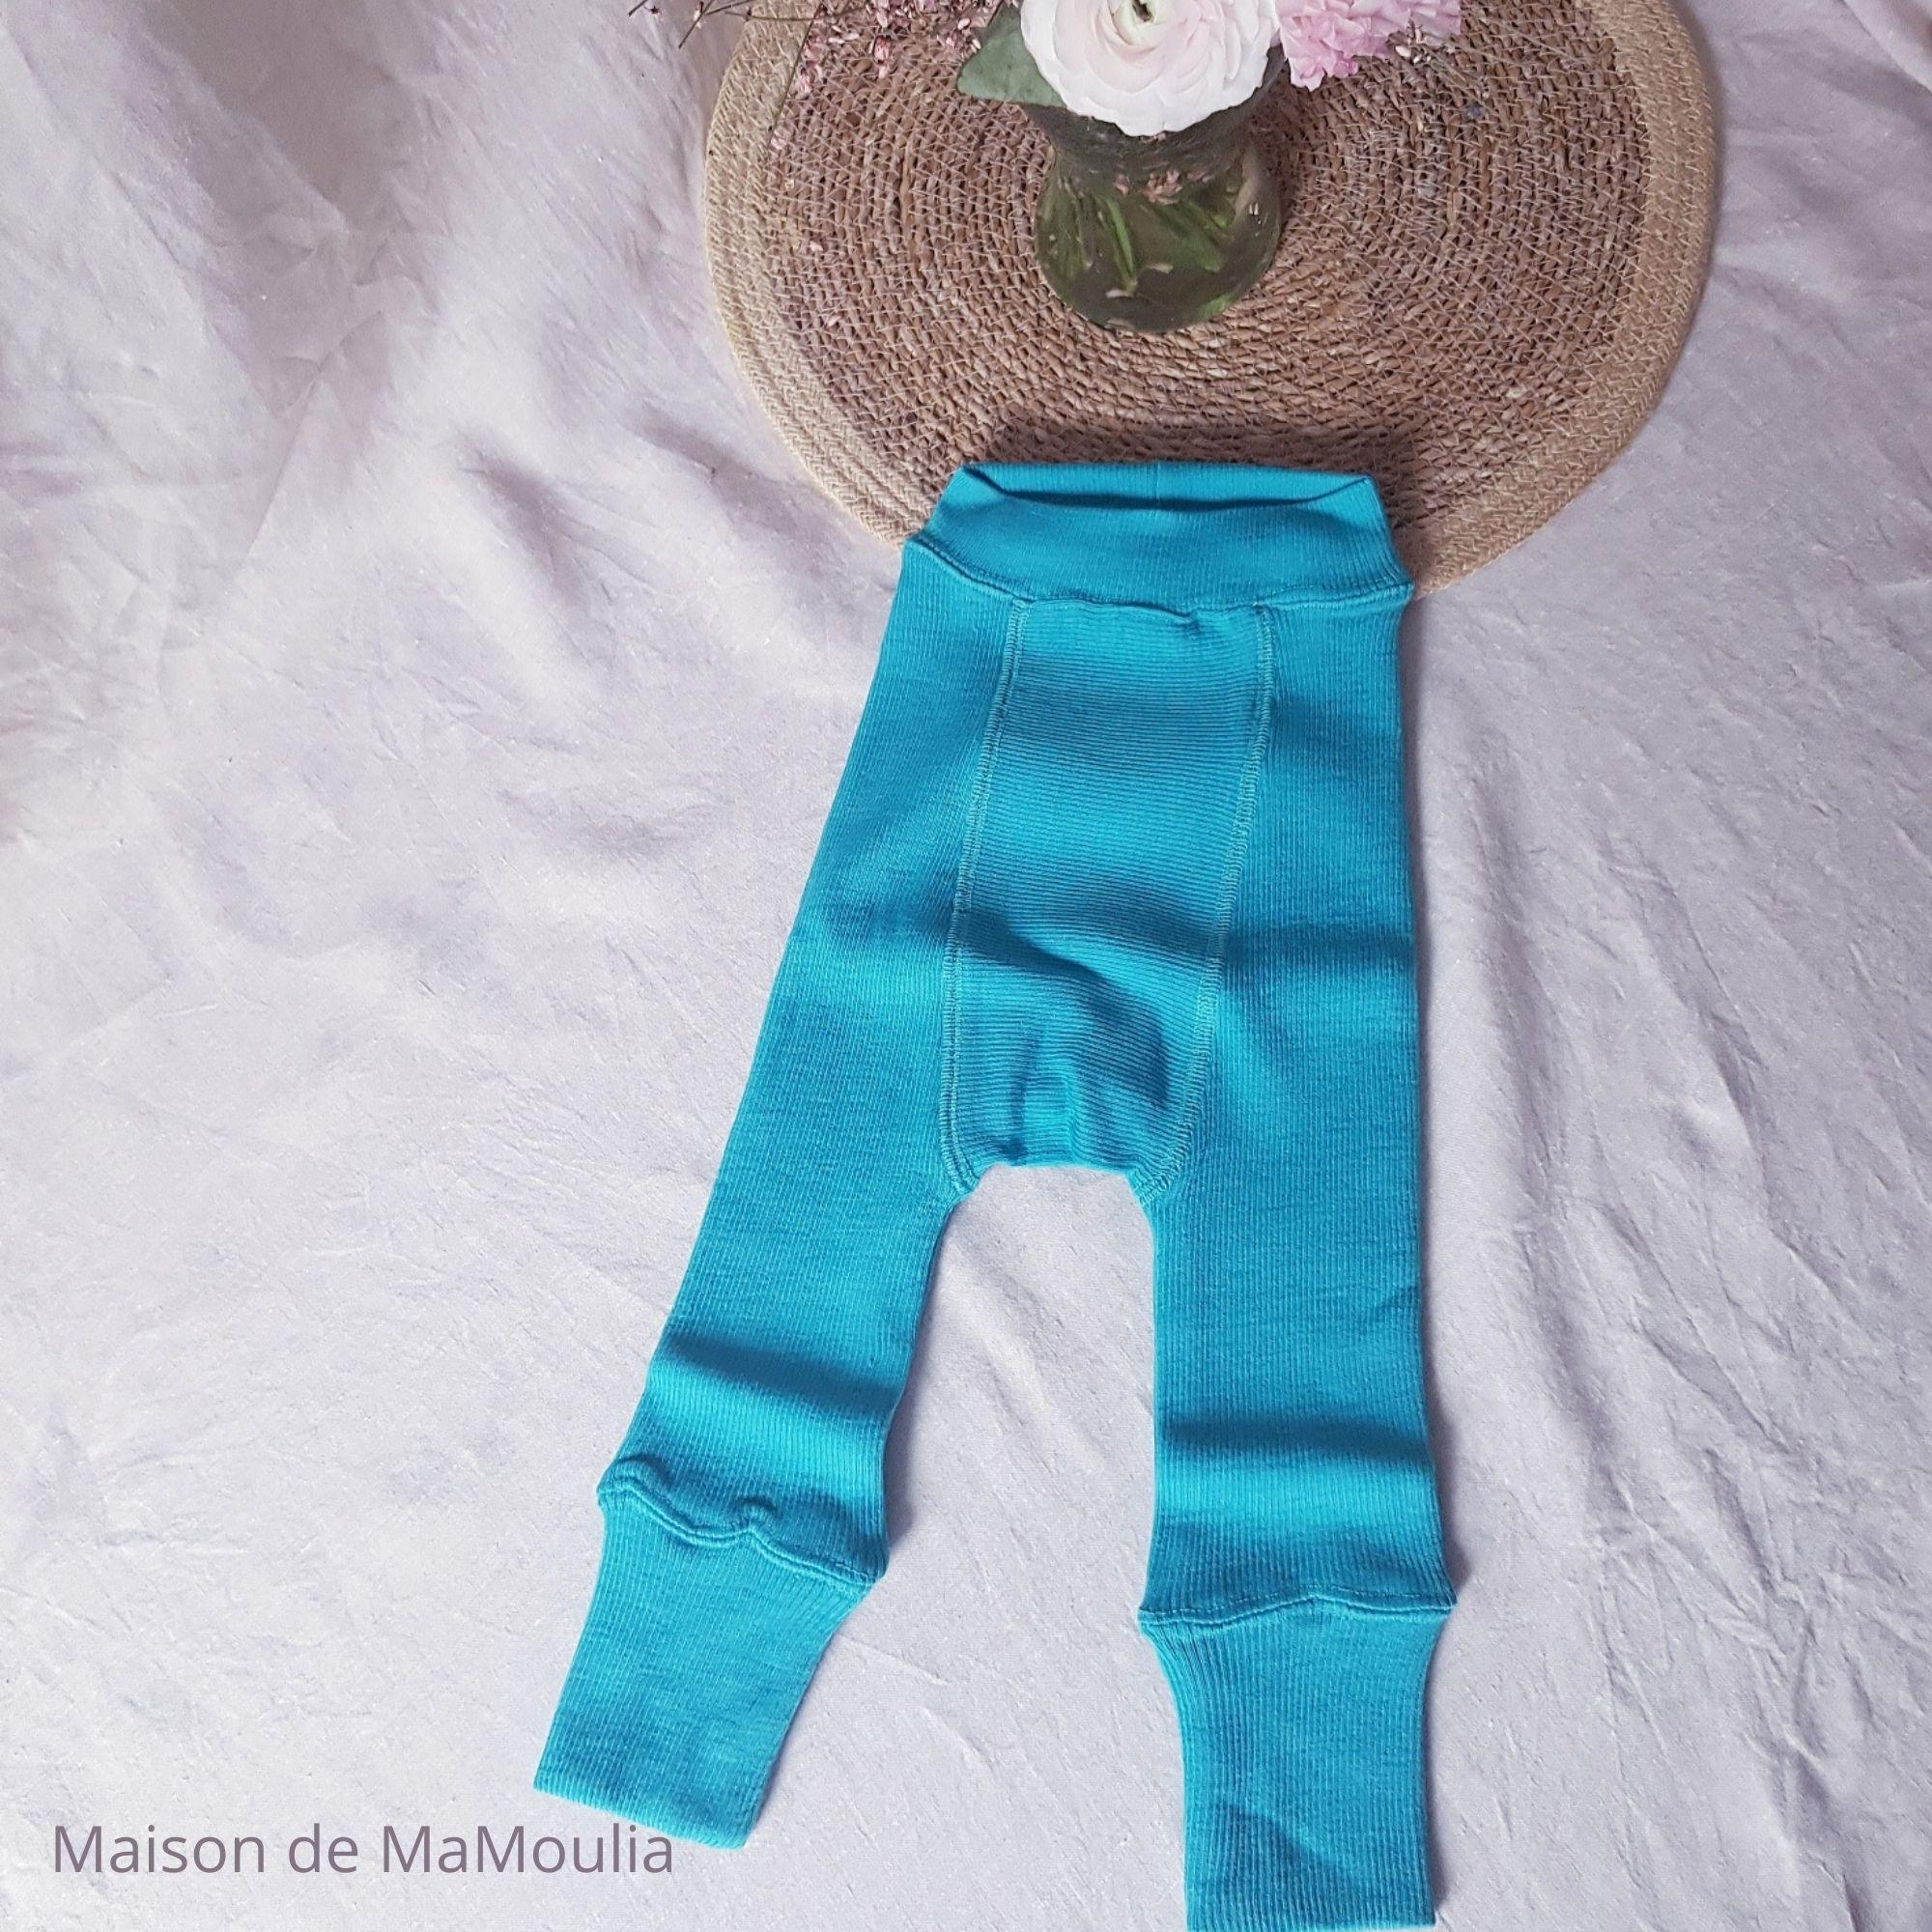 MANYMONTHS - LONGIES Pantalon Évolutif - 100% laine mérinos - Réversible - TURQUOISE/BLEU